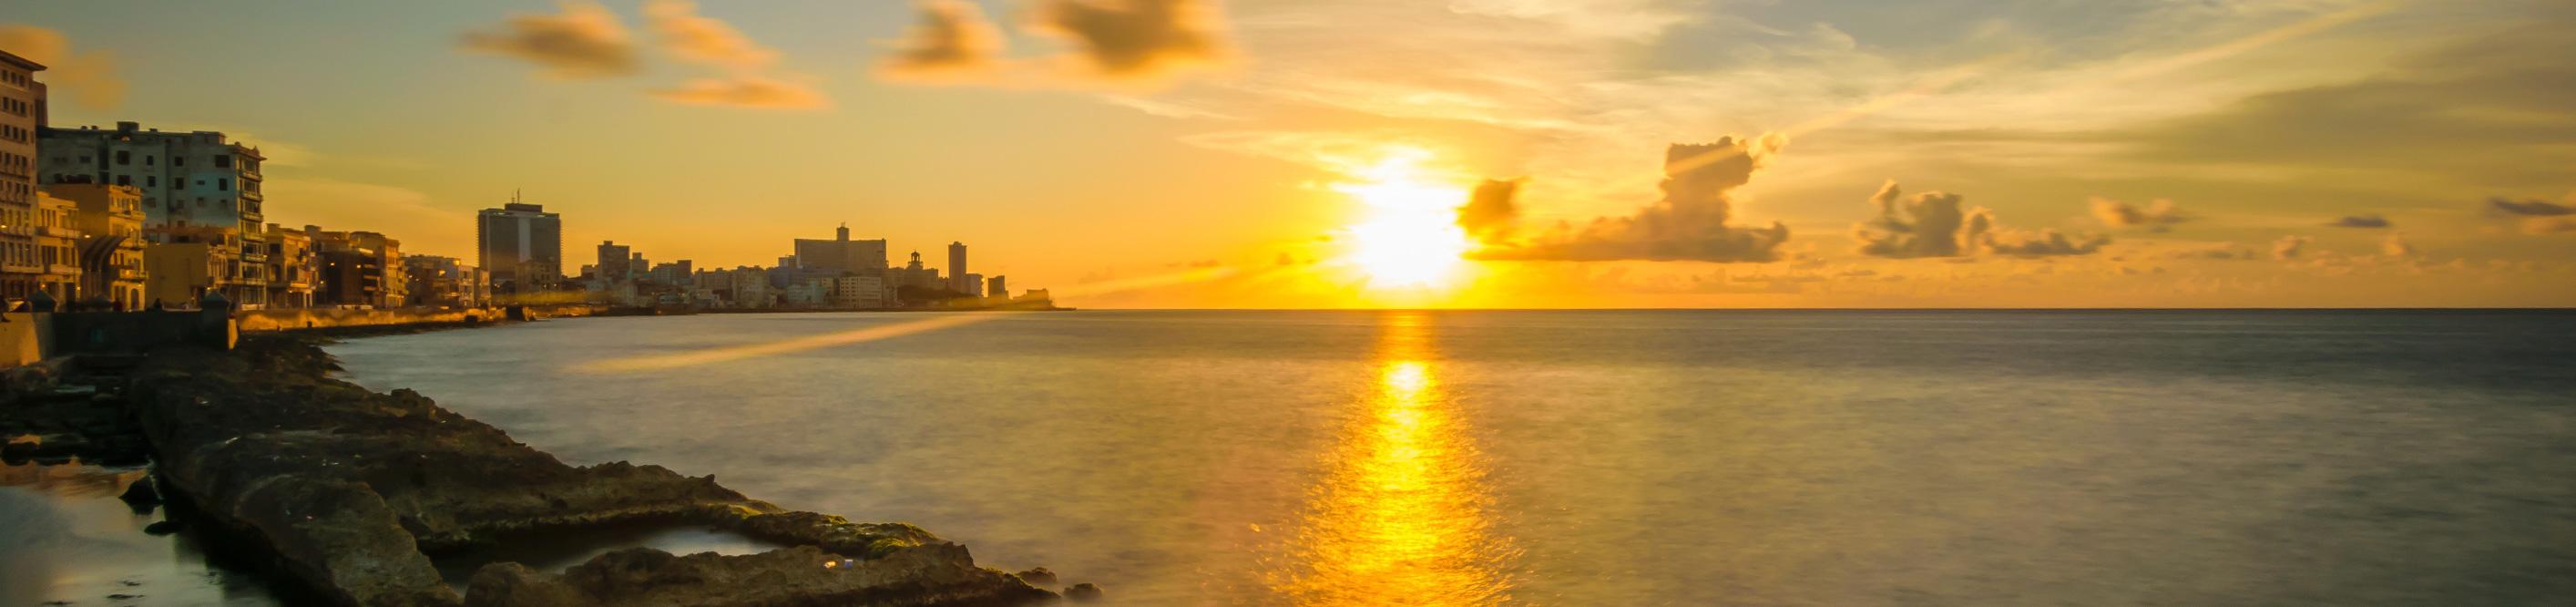 Морской круиз на Кубе